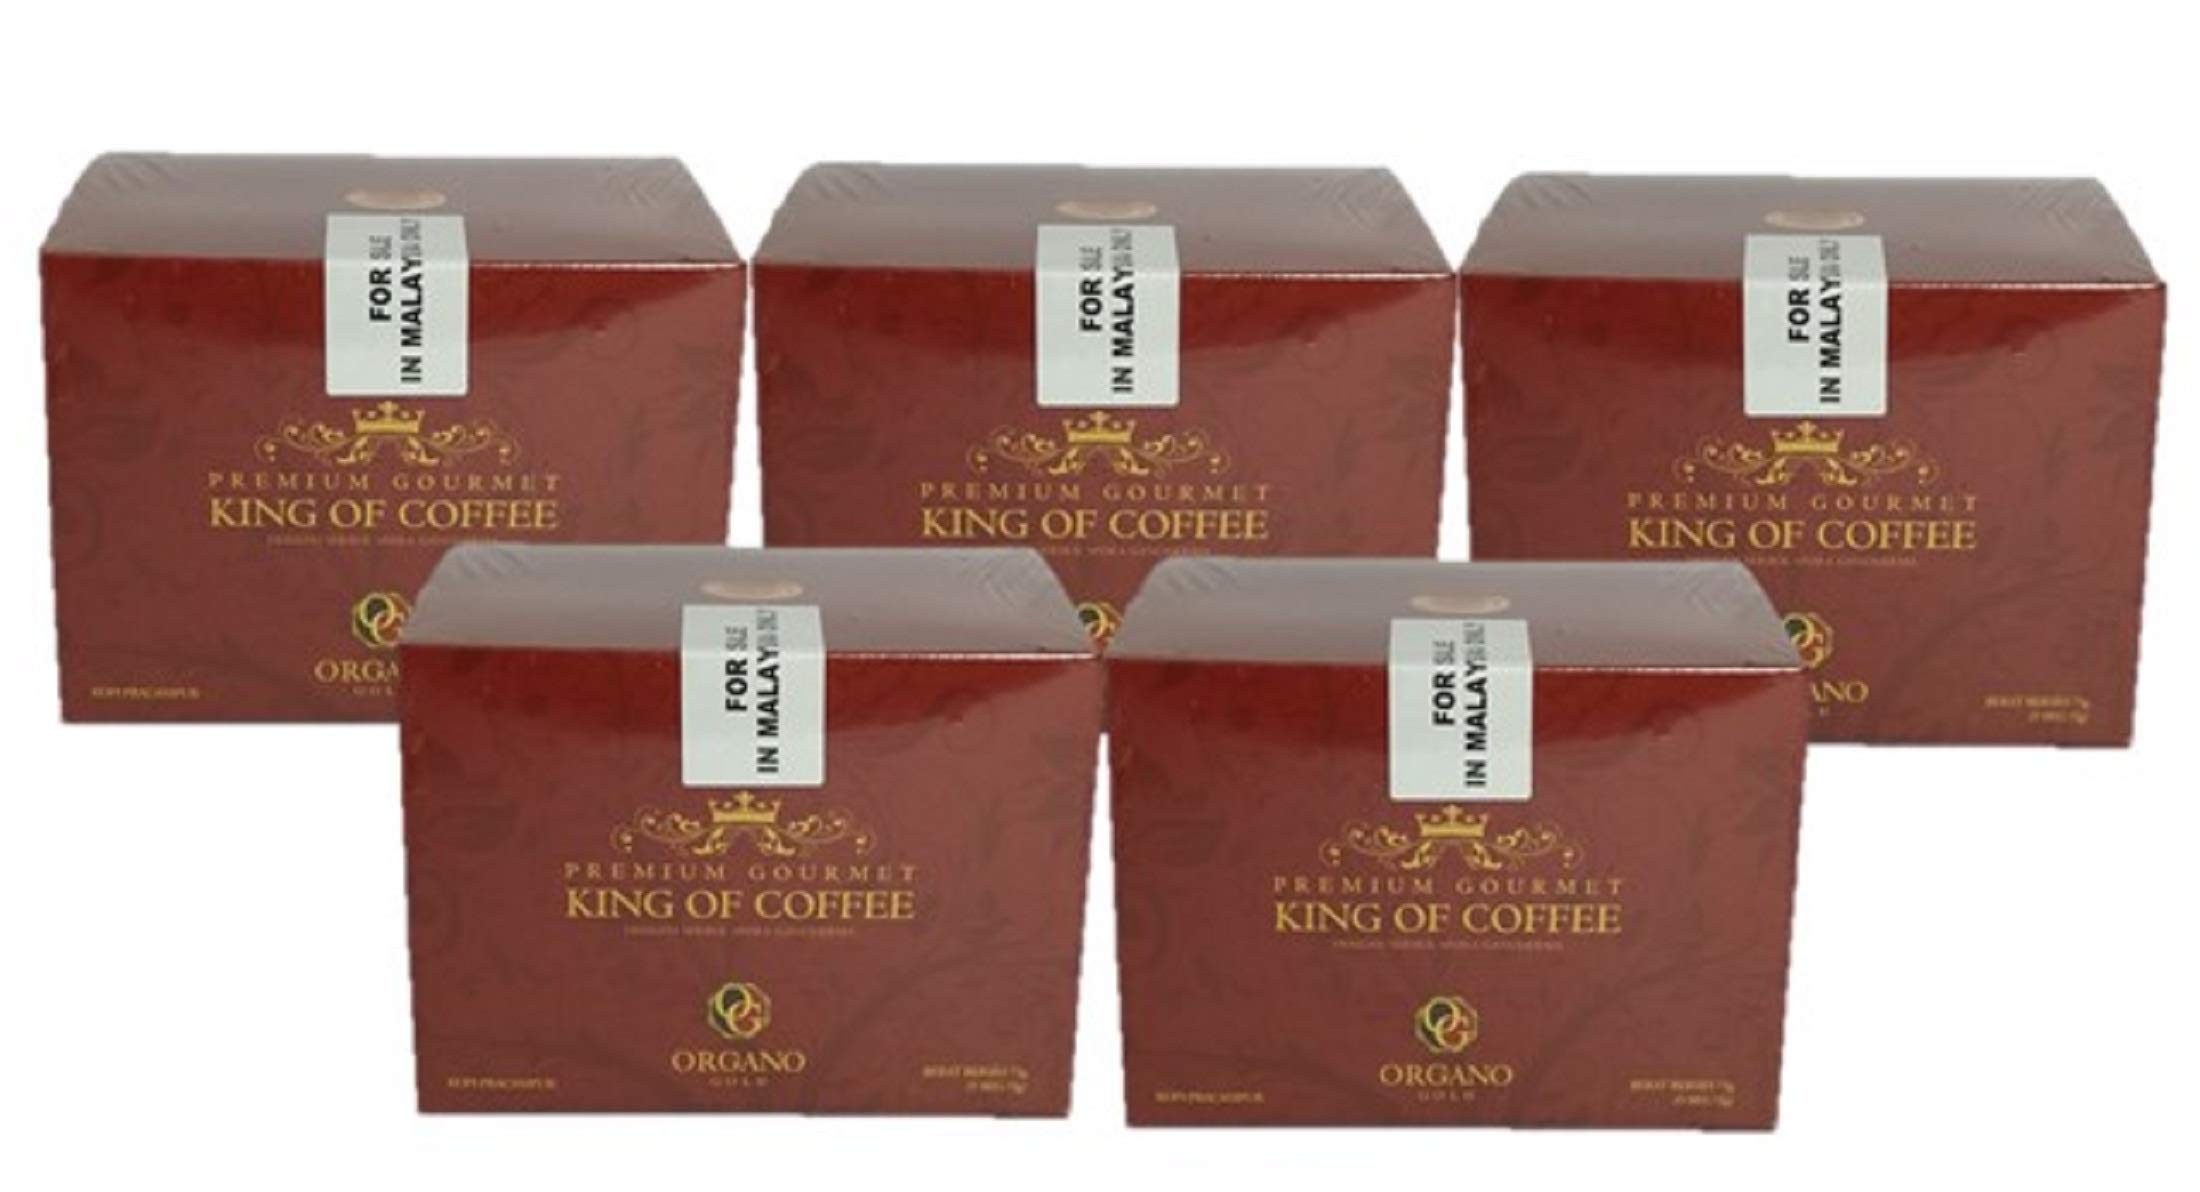 Organo Gold 5 Boxes Ganoderma Gourmet - Gourmet King Coffee (25 sachets)